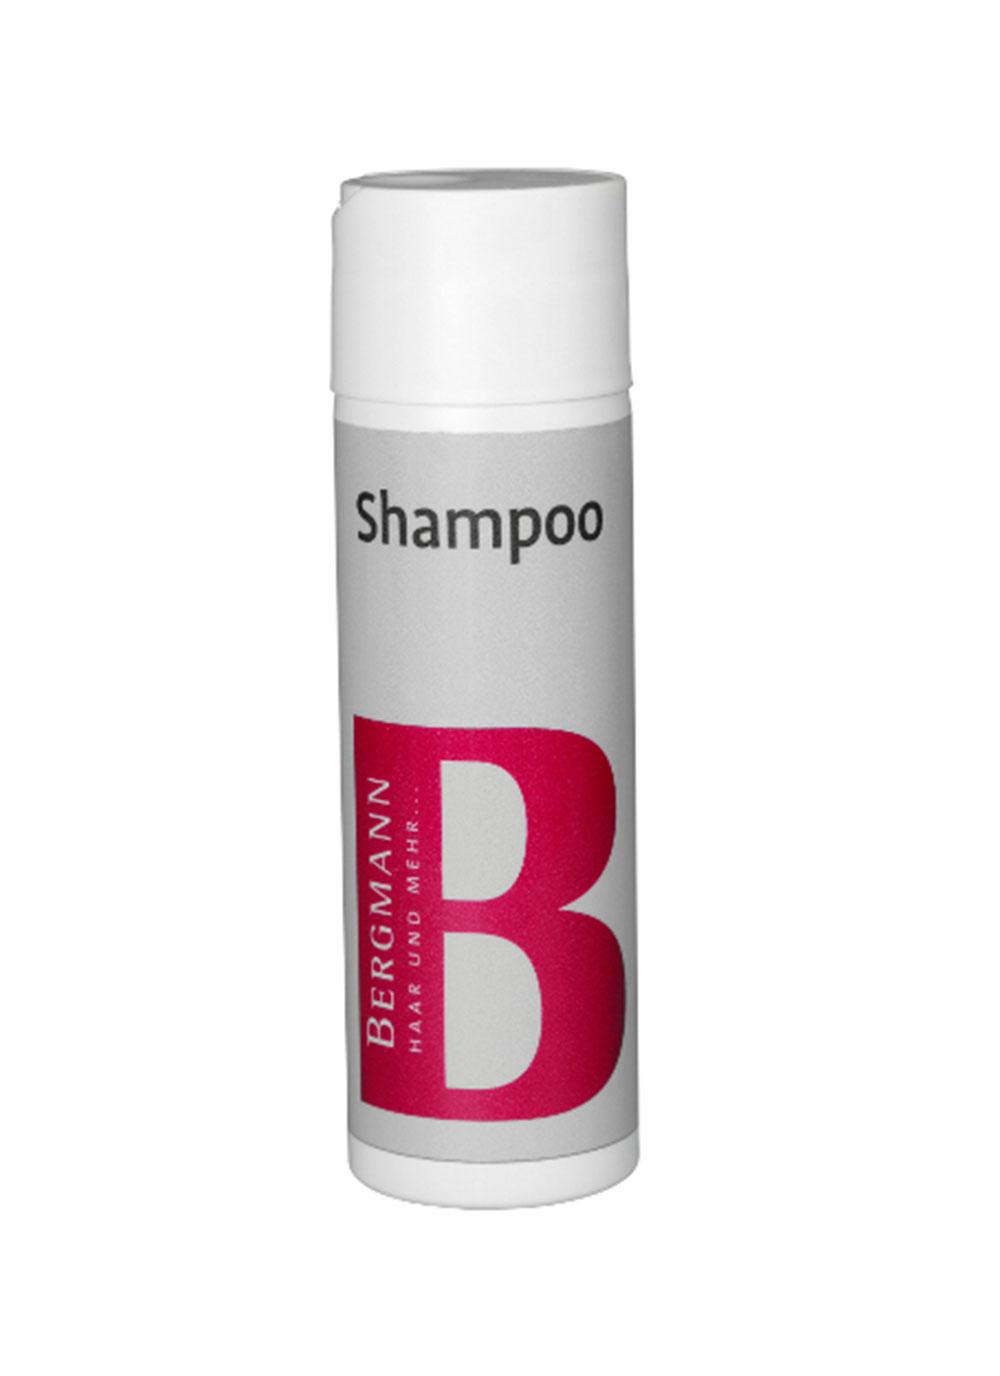 Bergmann Zubehör - Kunsthaar Shampoo 100ml